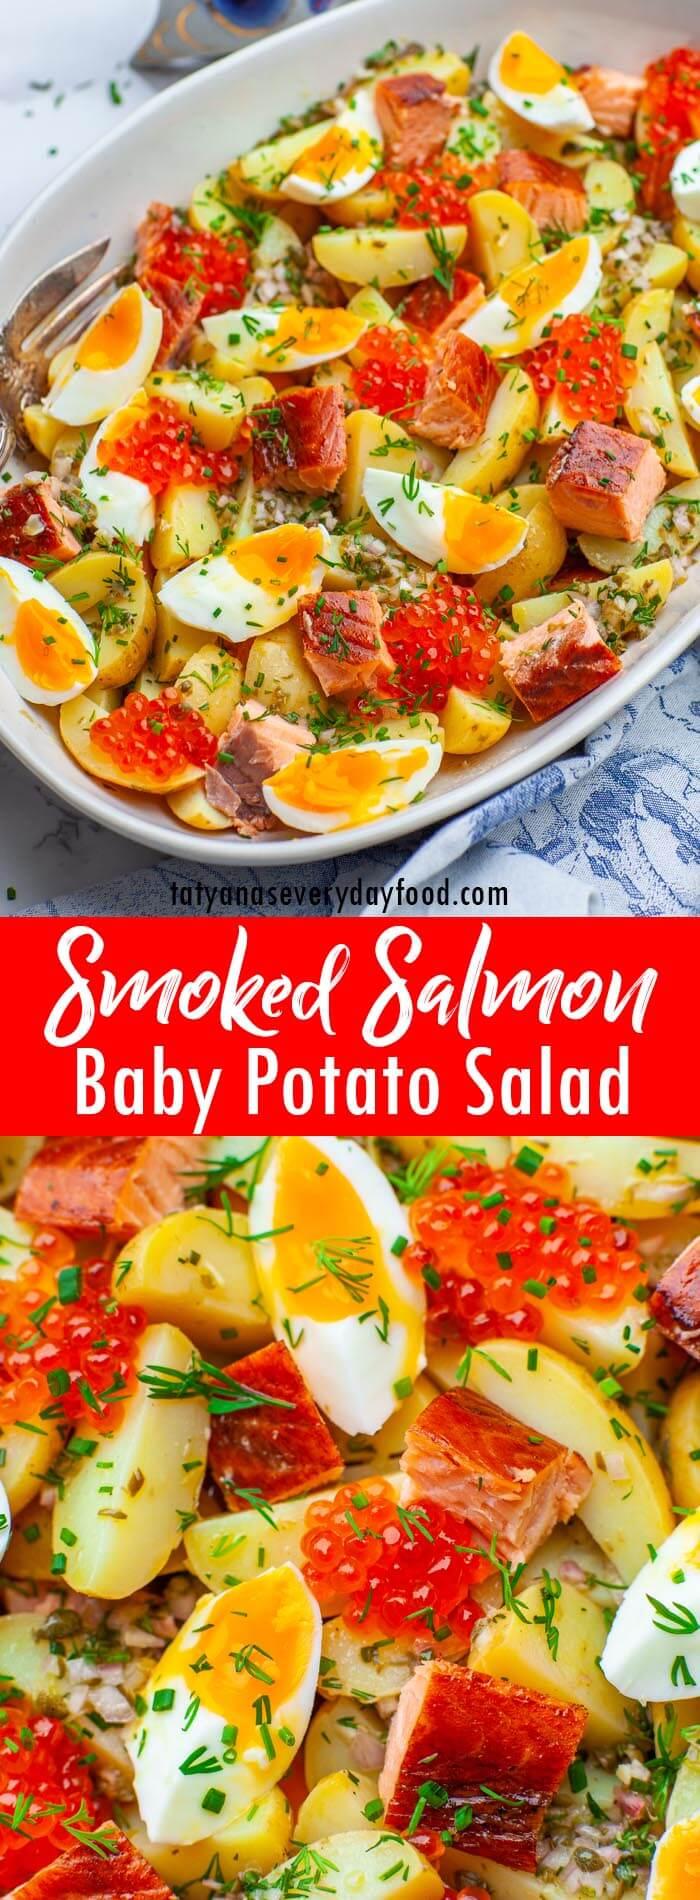 Video recipe for smoked salmon salad